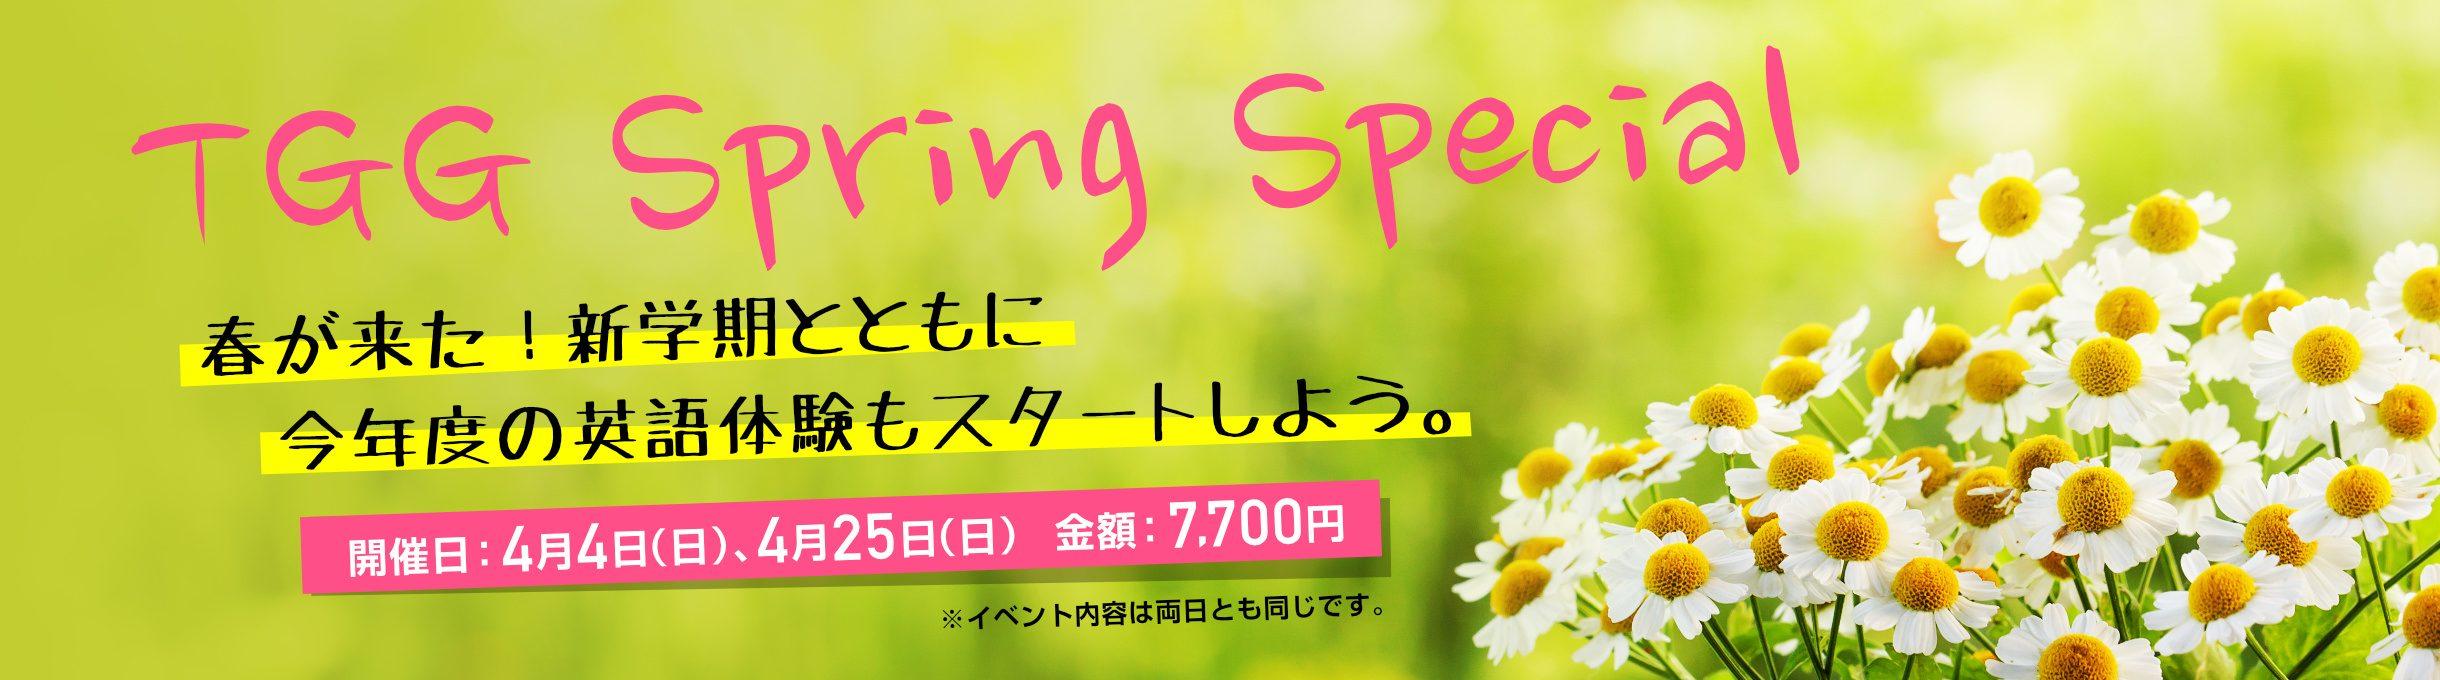 TGG Spring Special 春が来た!新学期とともに今年度の英語体験もスタートしよう。開催日: 4月4日(日)、4月25日(日) 金額: 7,700円 ※イベント内容は両日とも同じです。